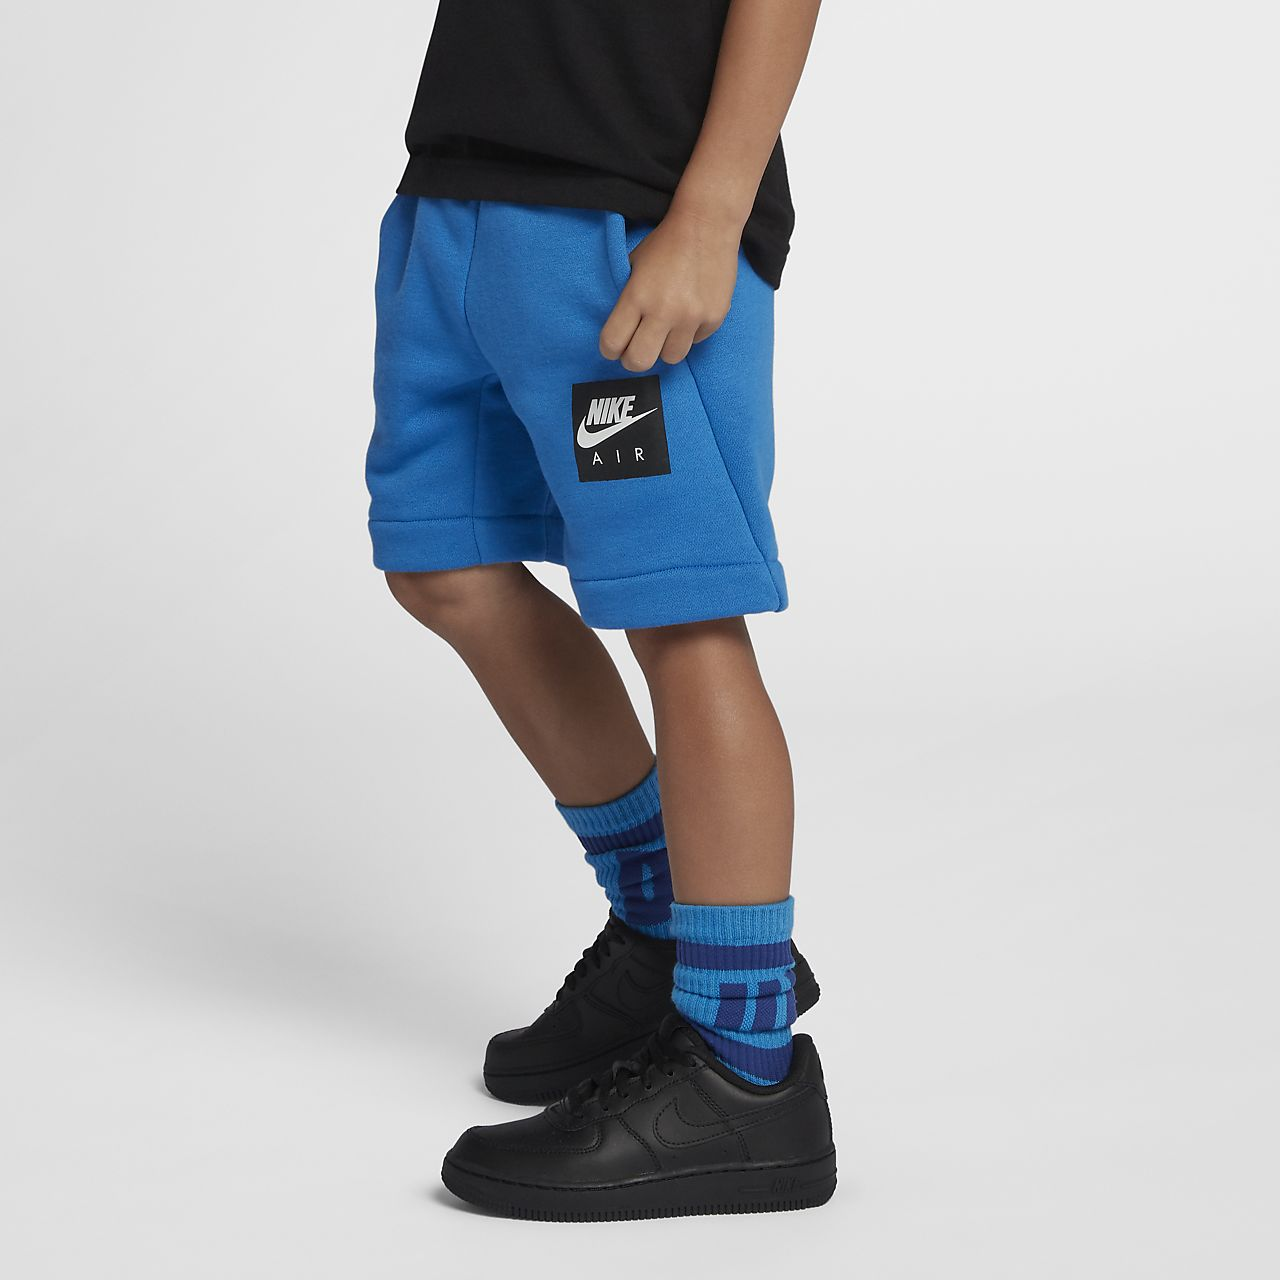 Nike Air Strickshorts für jüngere Kinder